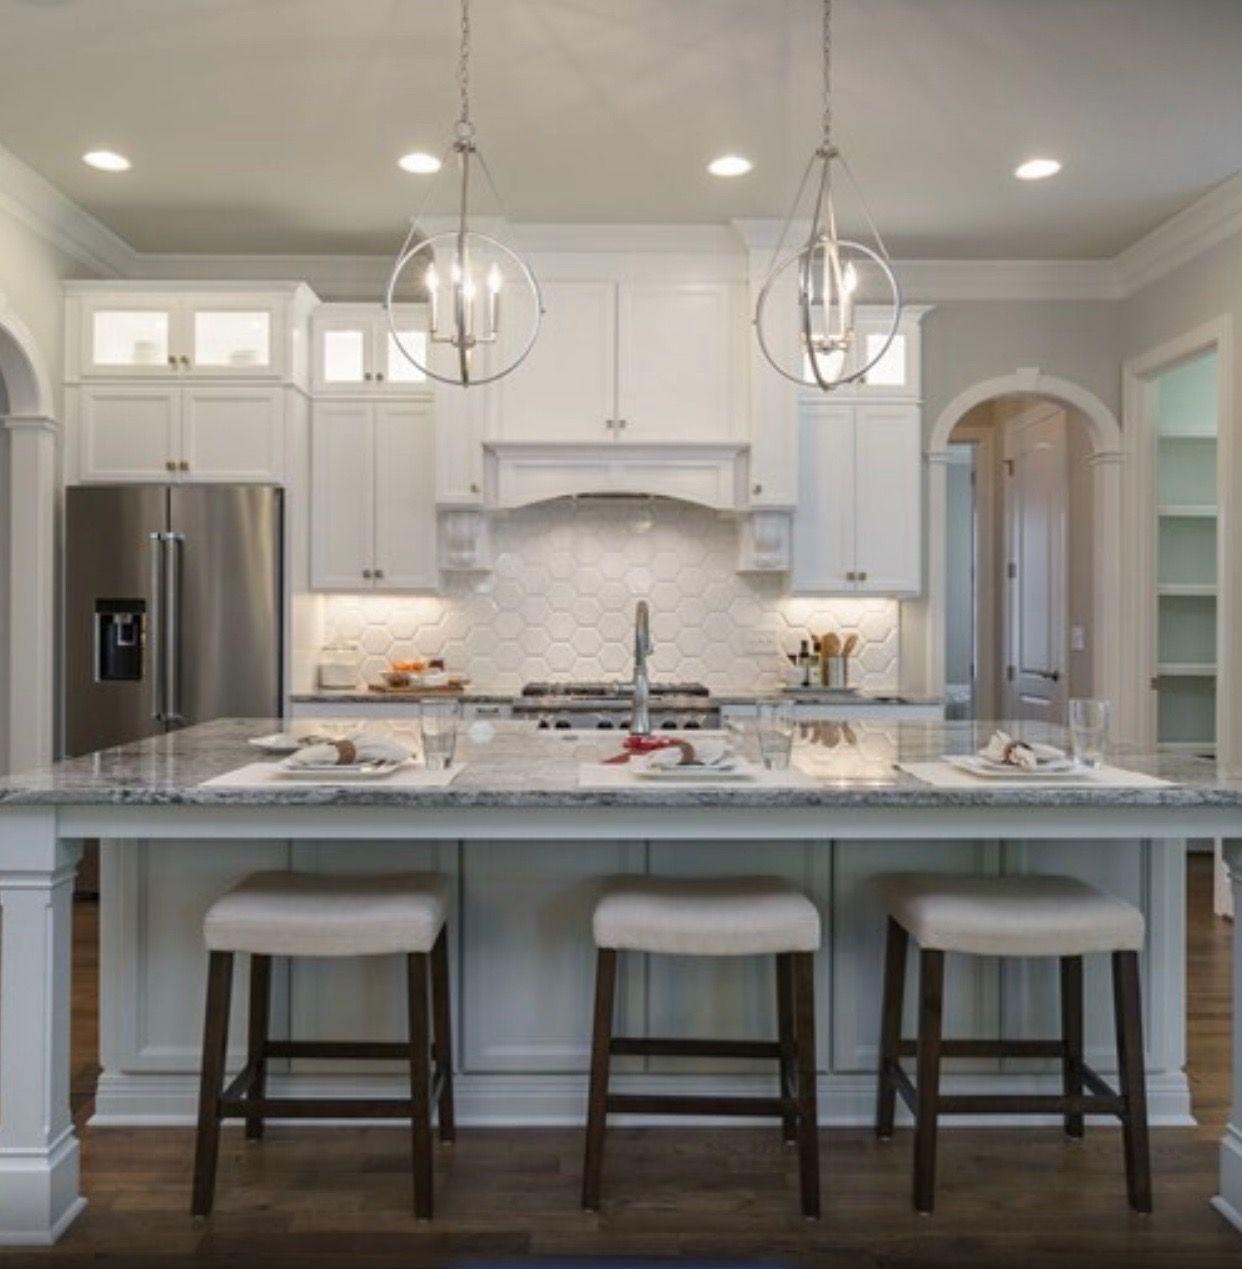 Capital Lighting Orb Style Pendants Above Island Lighting Over Island Kitchen Lighting Interior Design